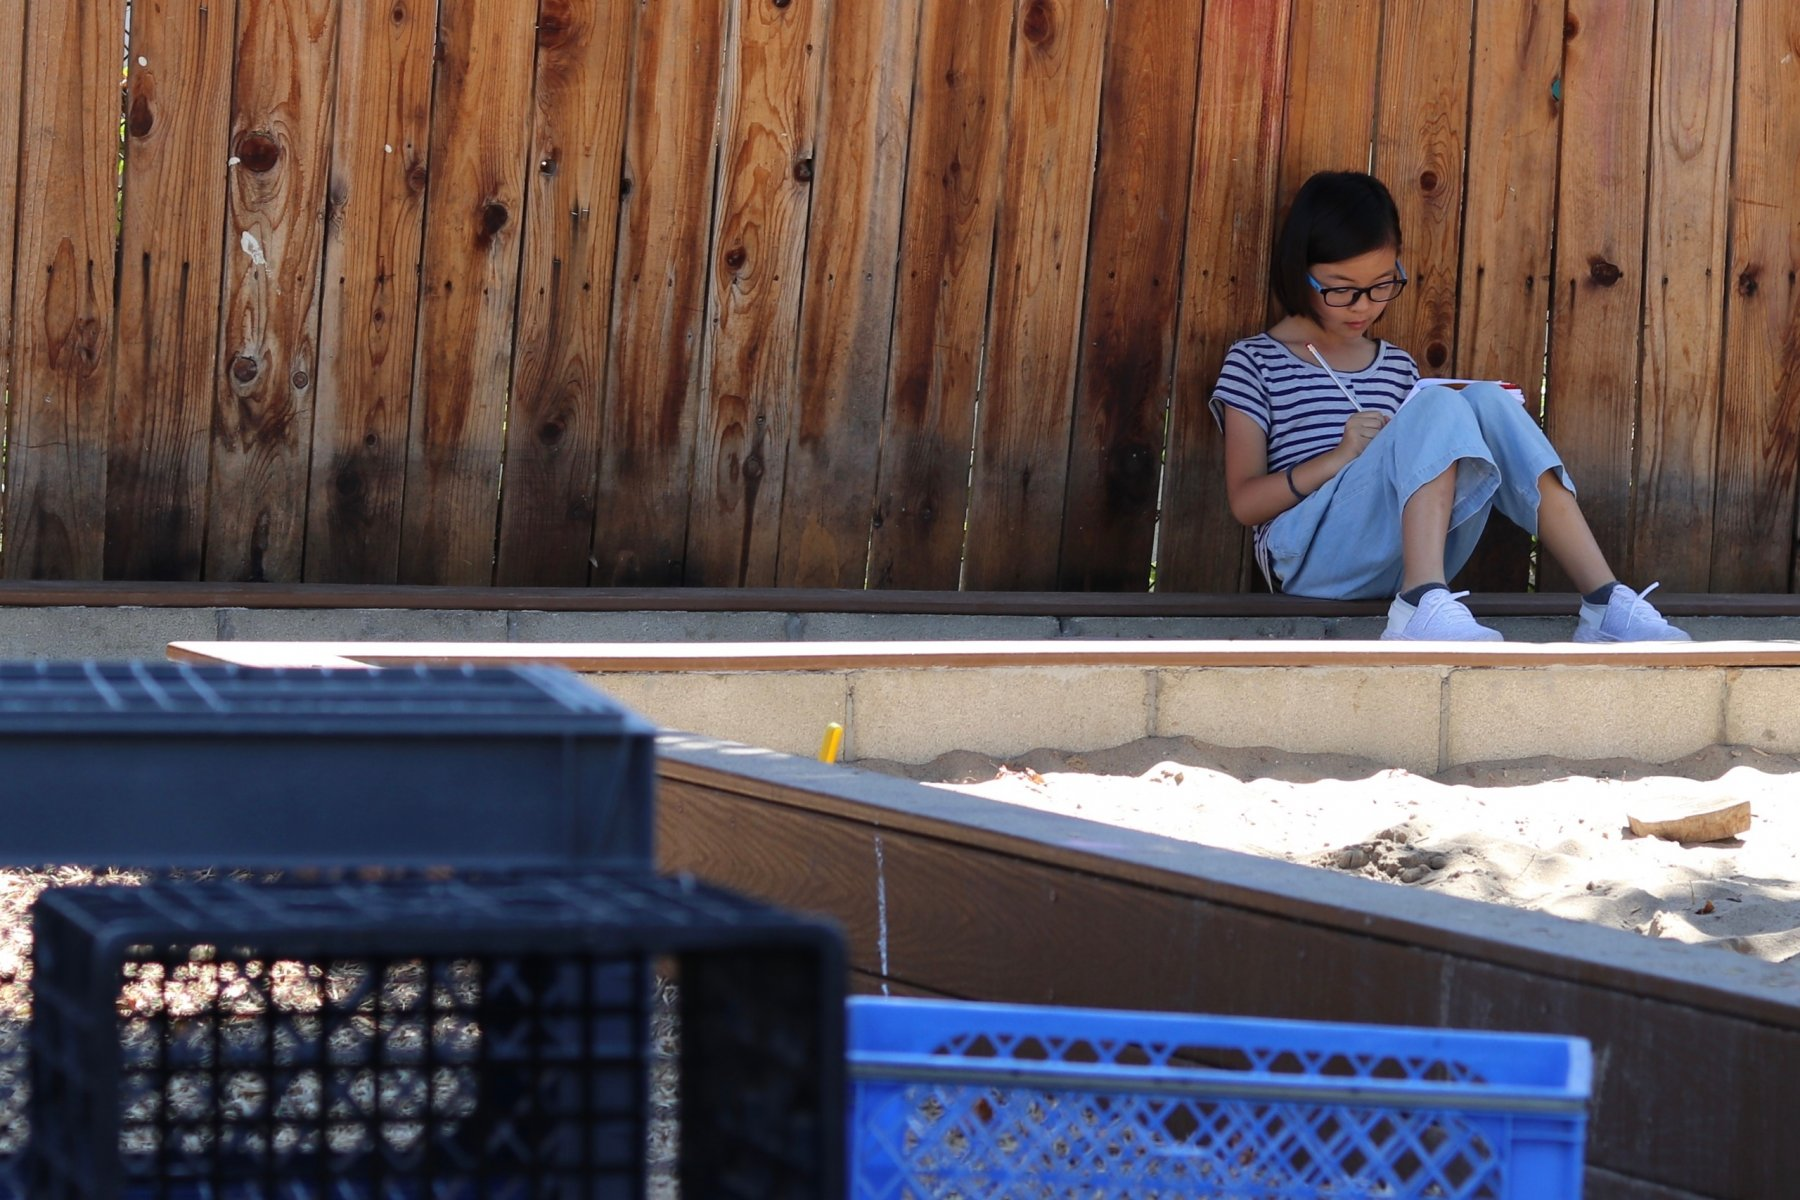 ES girl writing solo play yard